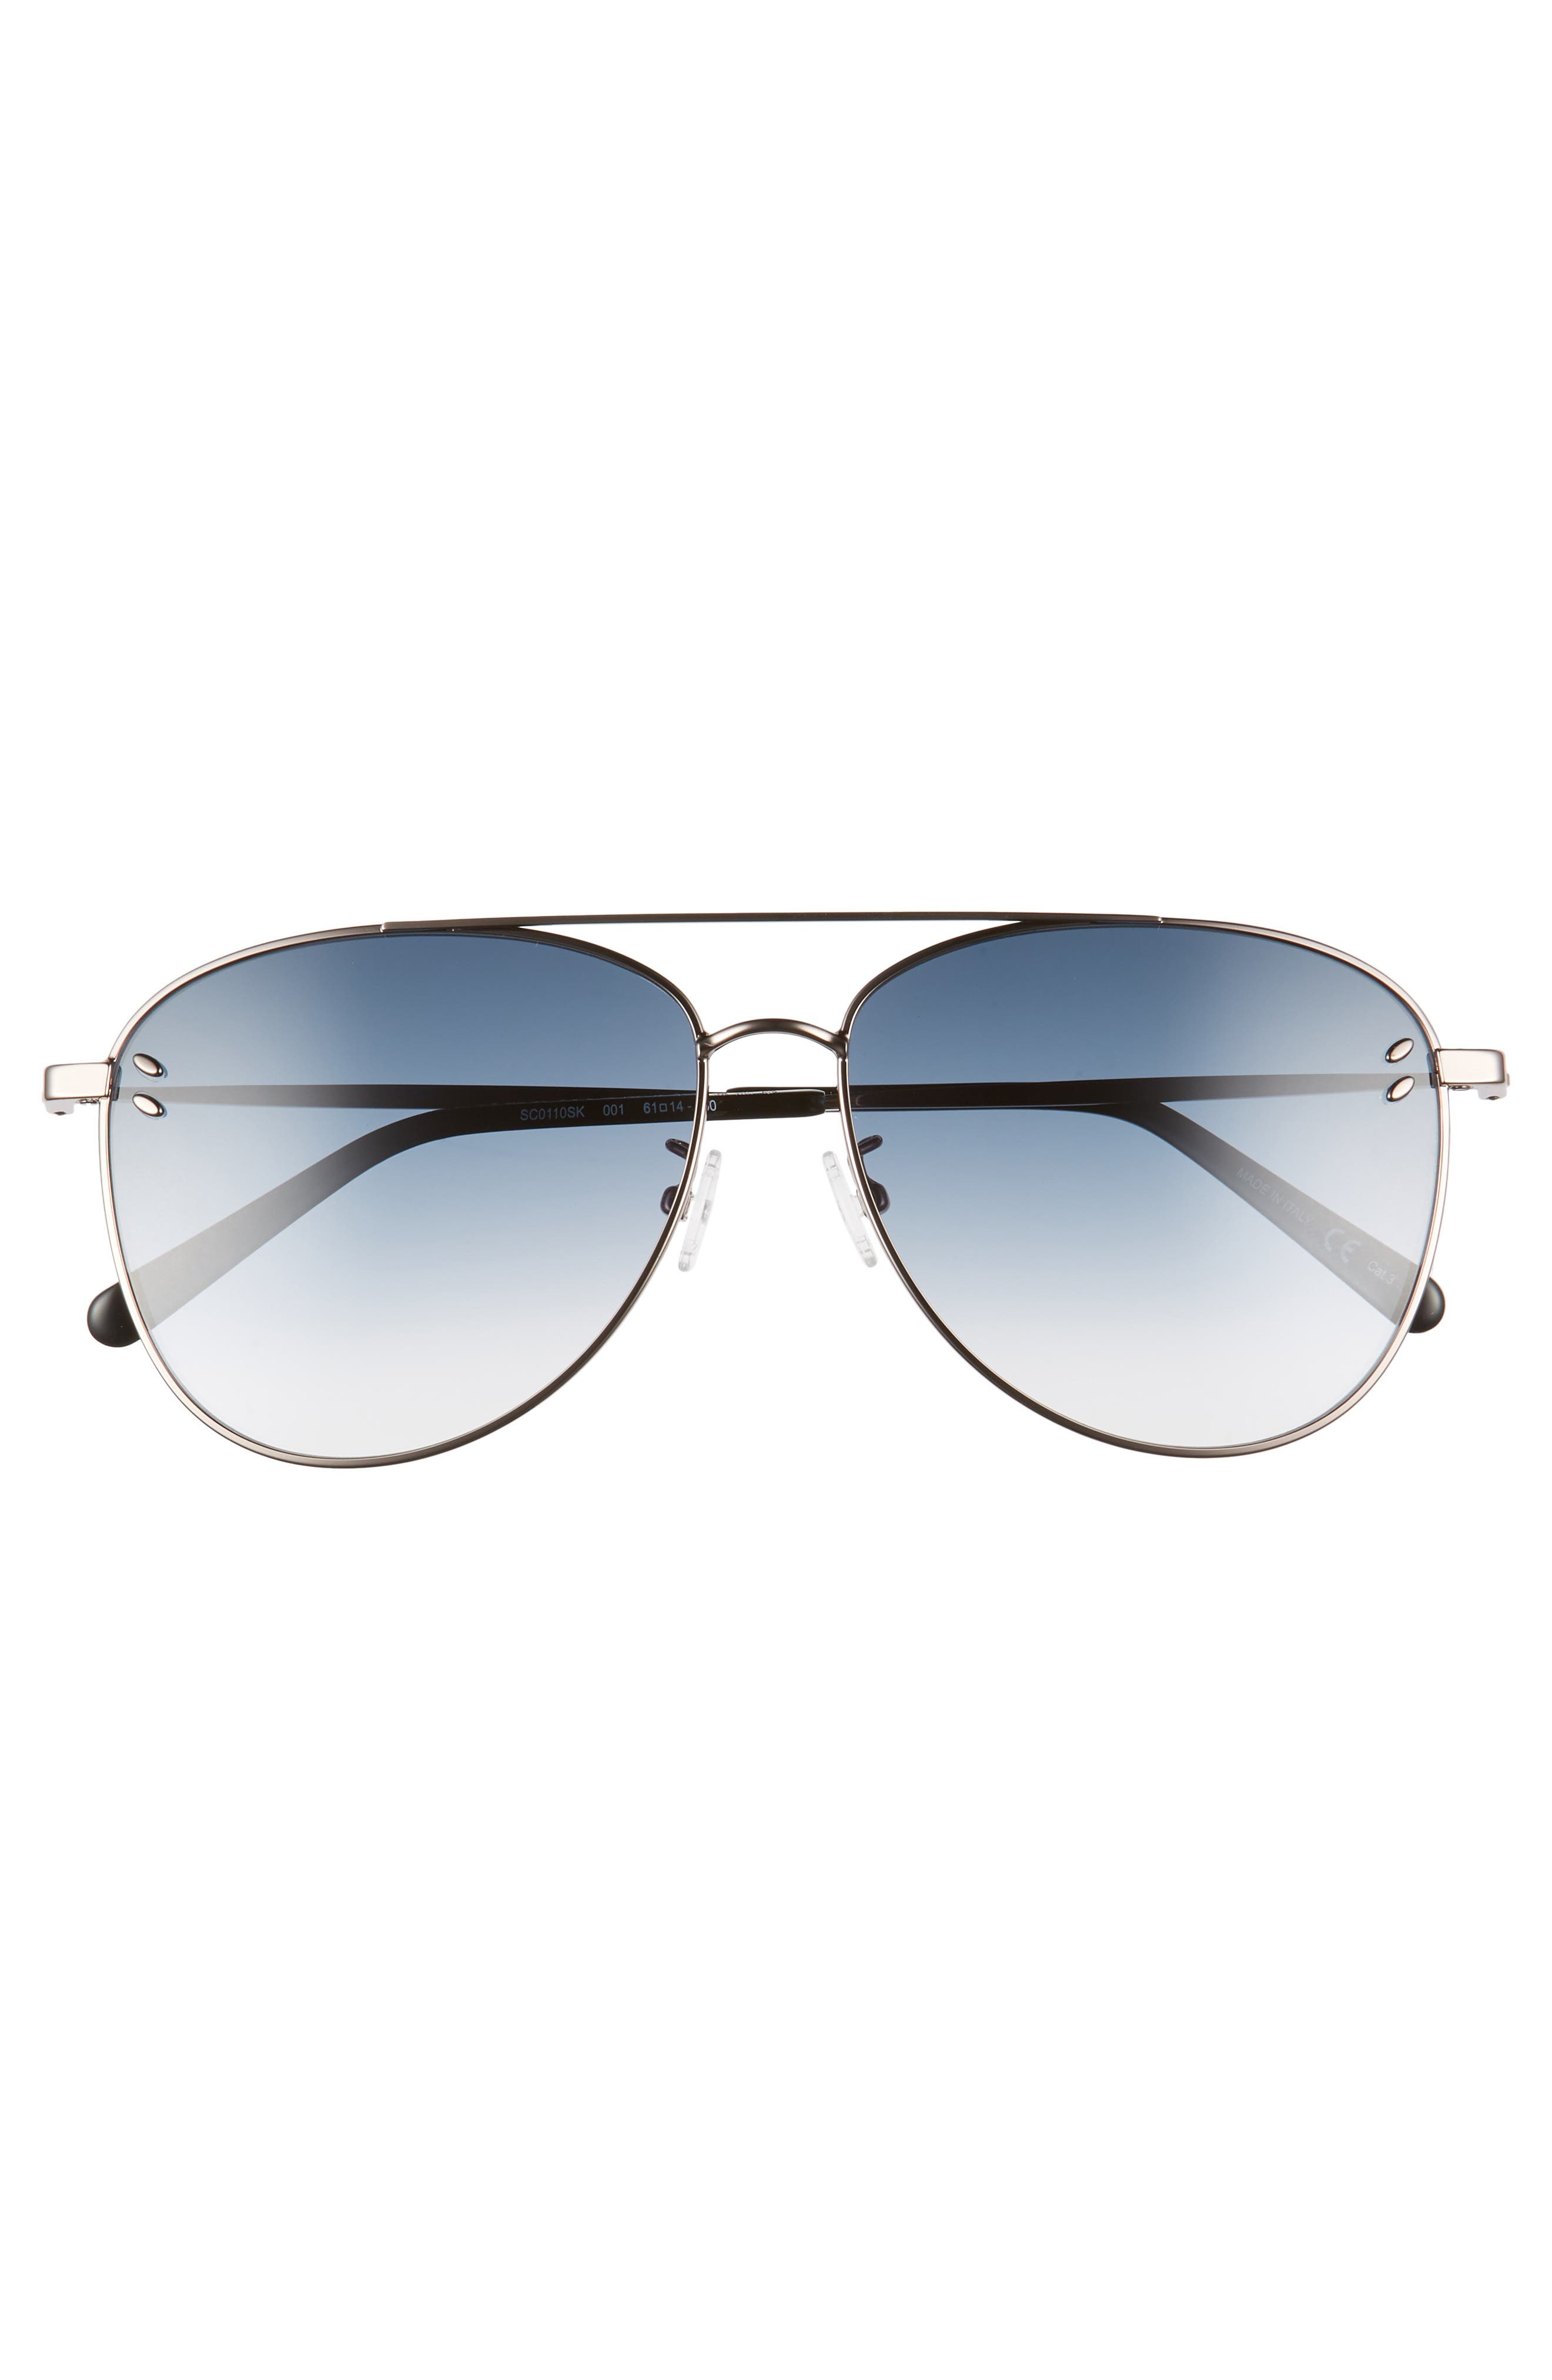 61mm Aviator Sunglasses,                             Alternate thumbnail 3, color,                             041